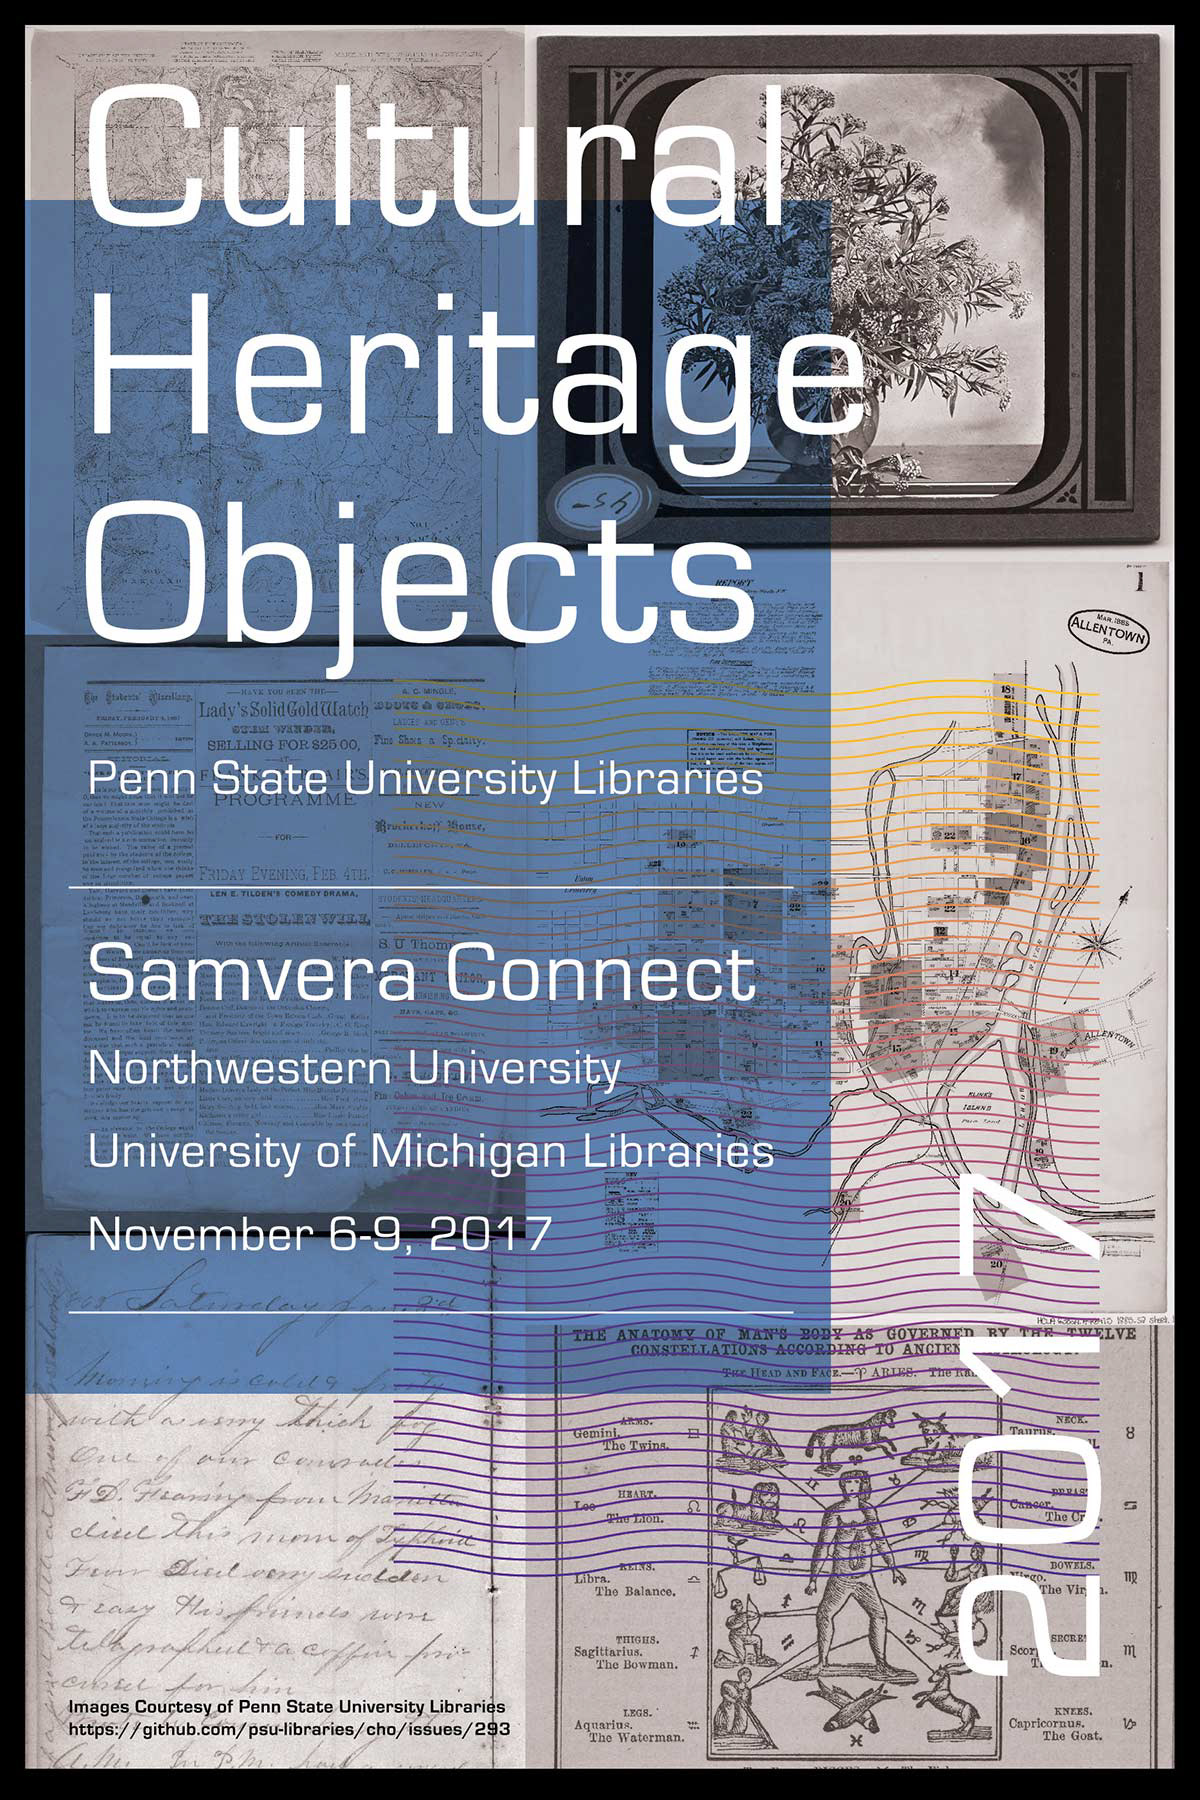 poster design libraries Universities open source software